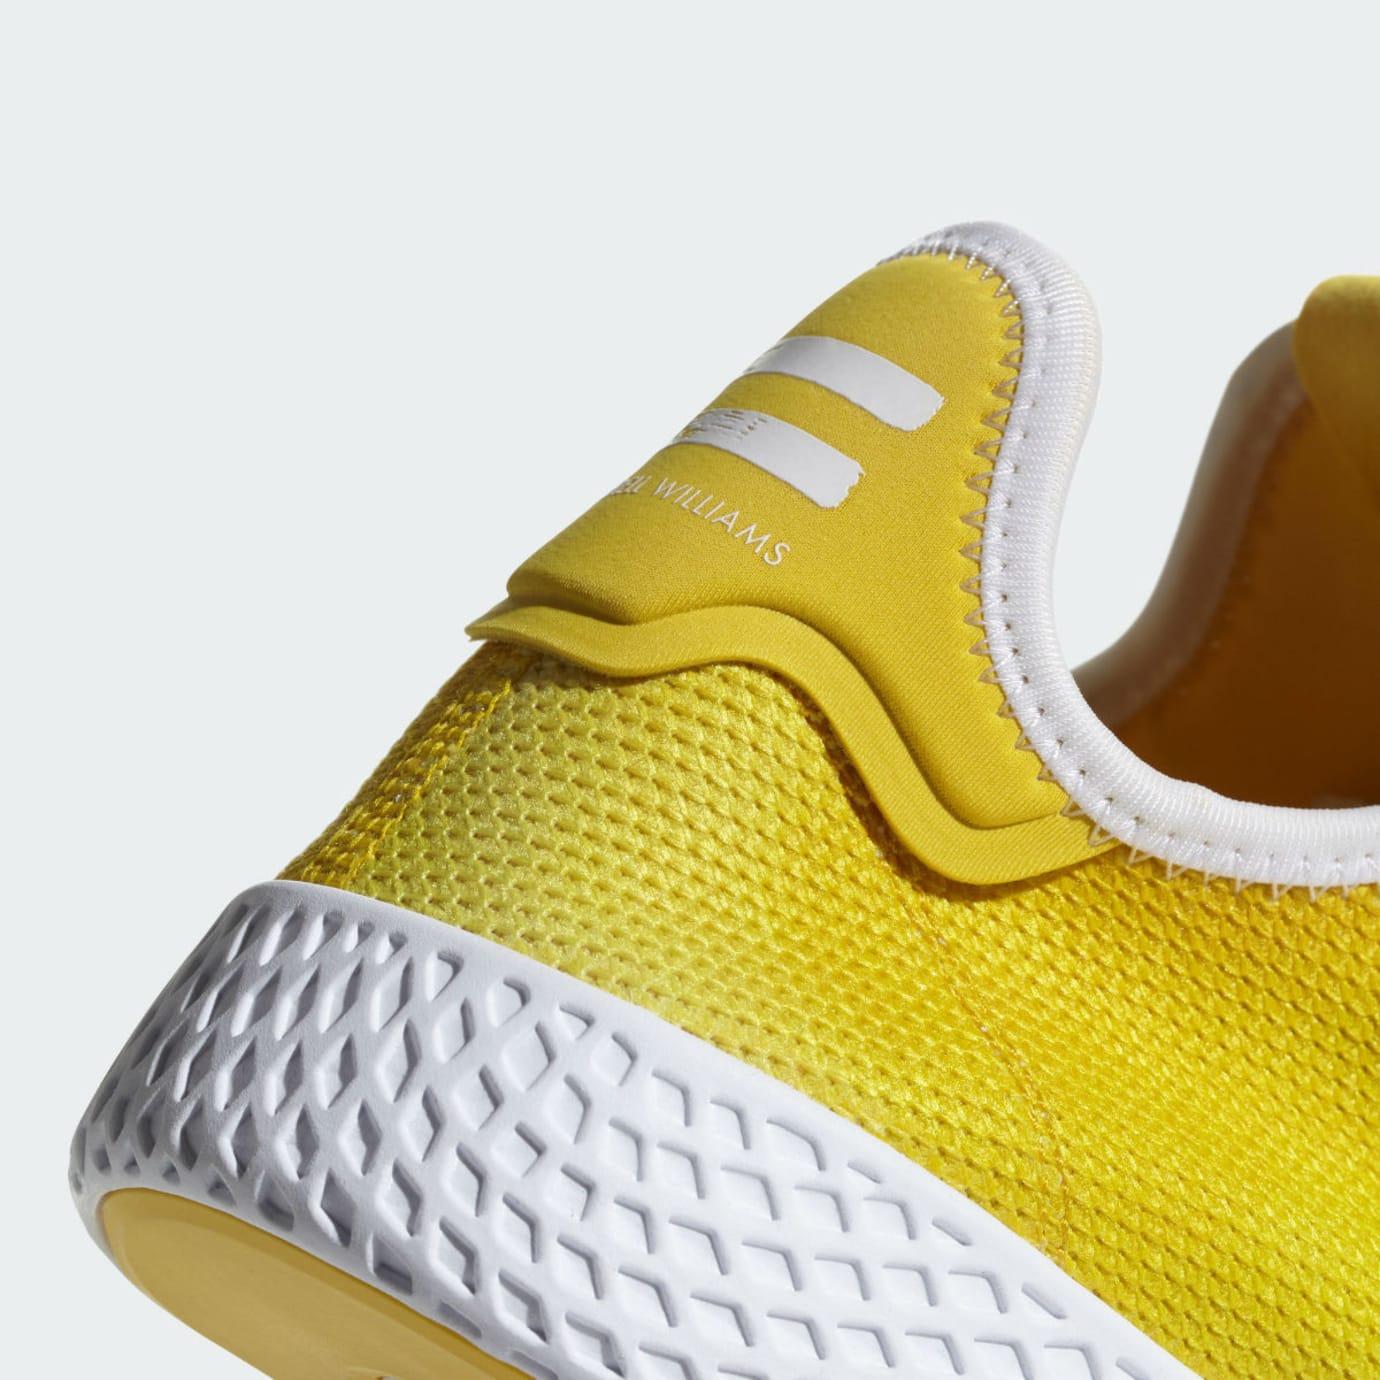 Pharrell x Adidas Tennis Hu Holi Bright Yellow Release Date DA9617 Heel